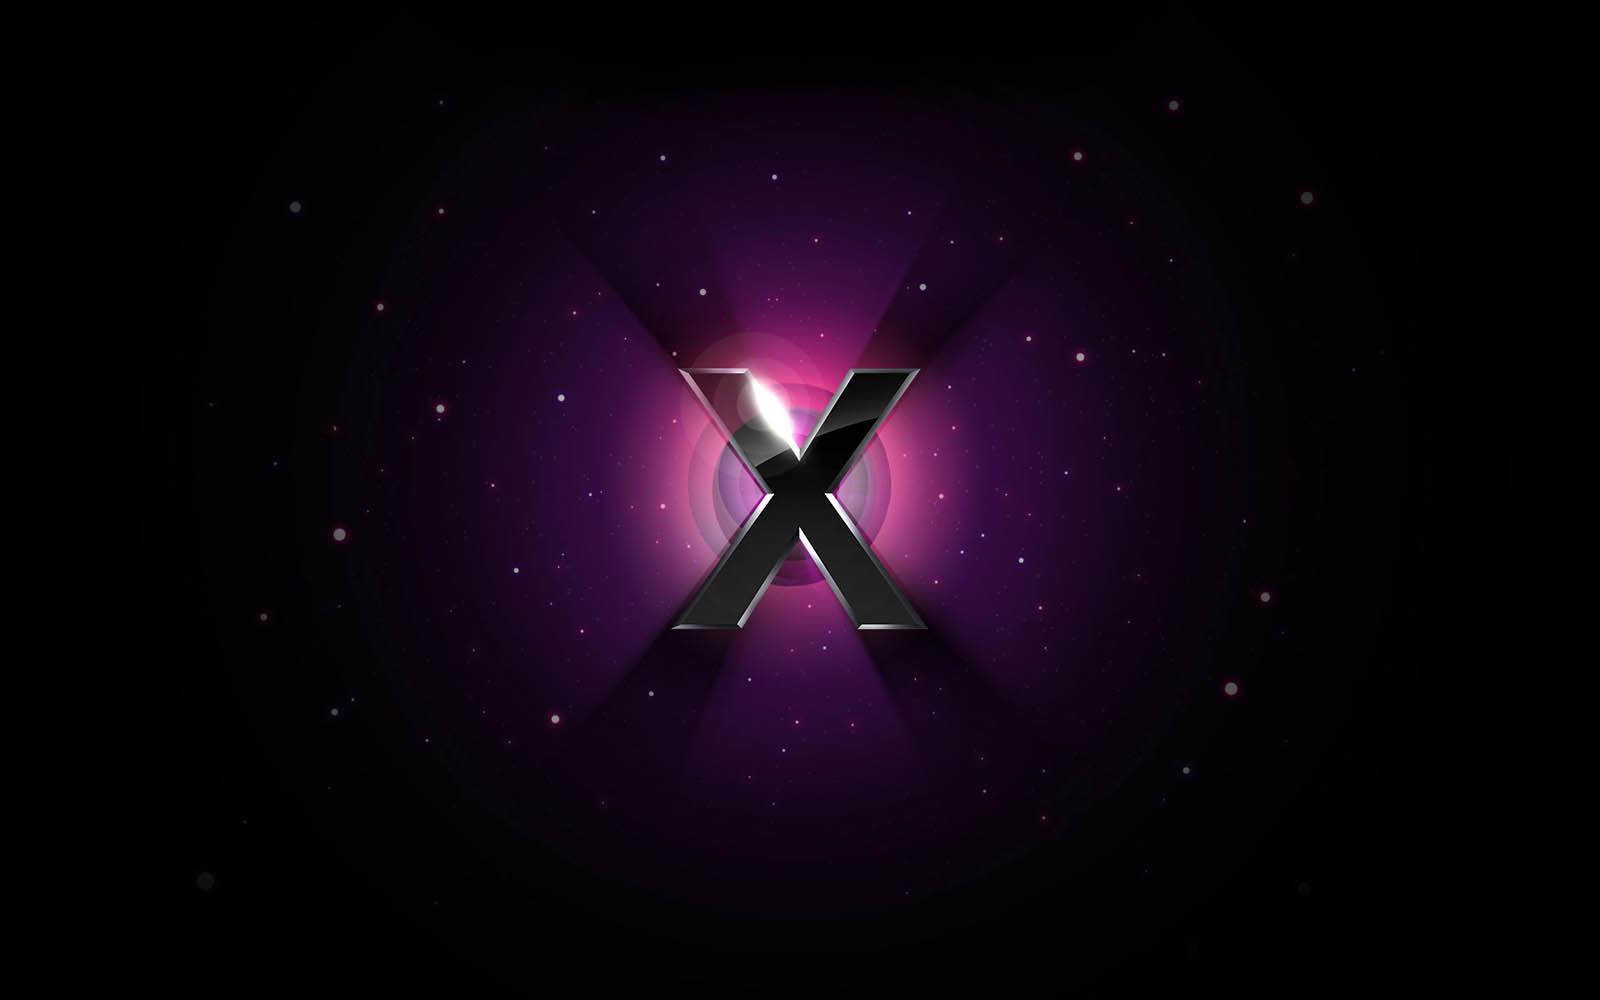 http://2.bp.blogspot.com/-CwAkQqIi82c/UEW8j-crUJI/AAAAAAAAJL8/ckCWC1eKxl0/s1600/Mac+OS+X+Wallpapers+8.jpg